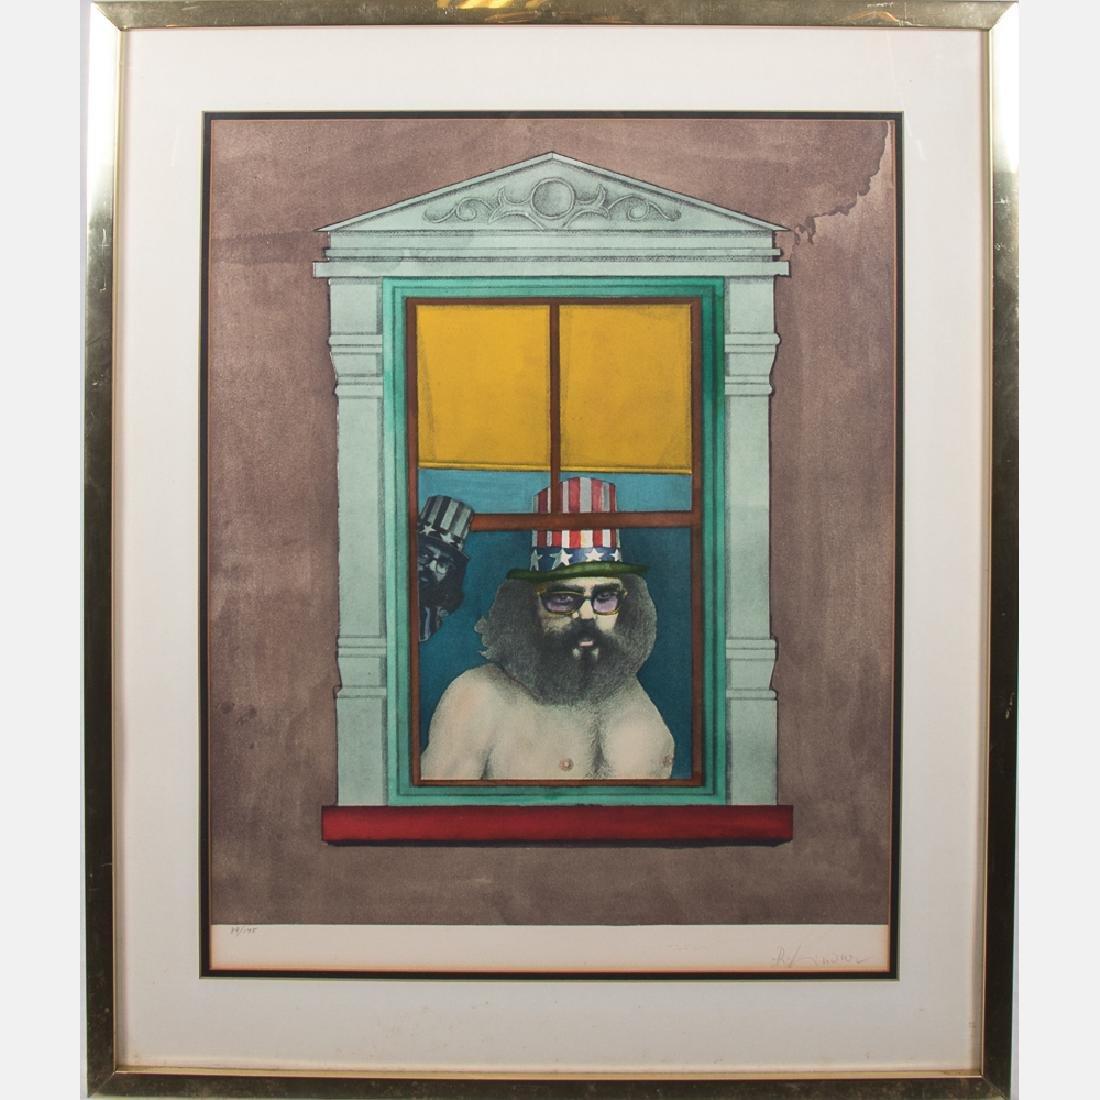 Richard Lindner (1901-1978) Allen Ginsburg, Lithograph,